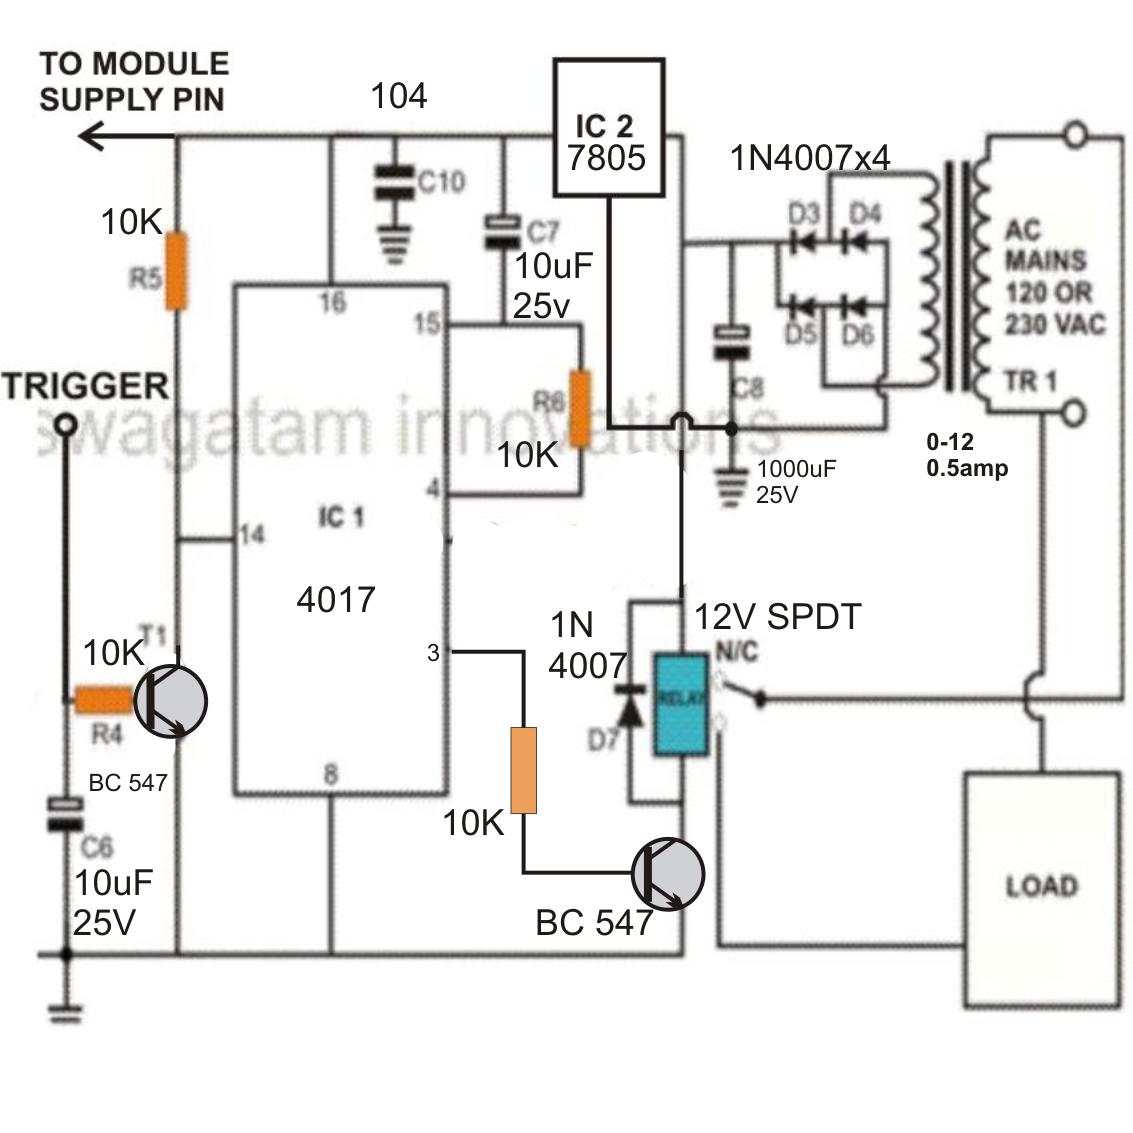 a20 wiring diagram